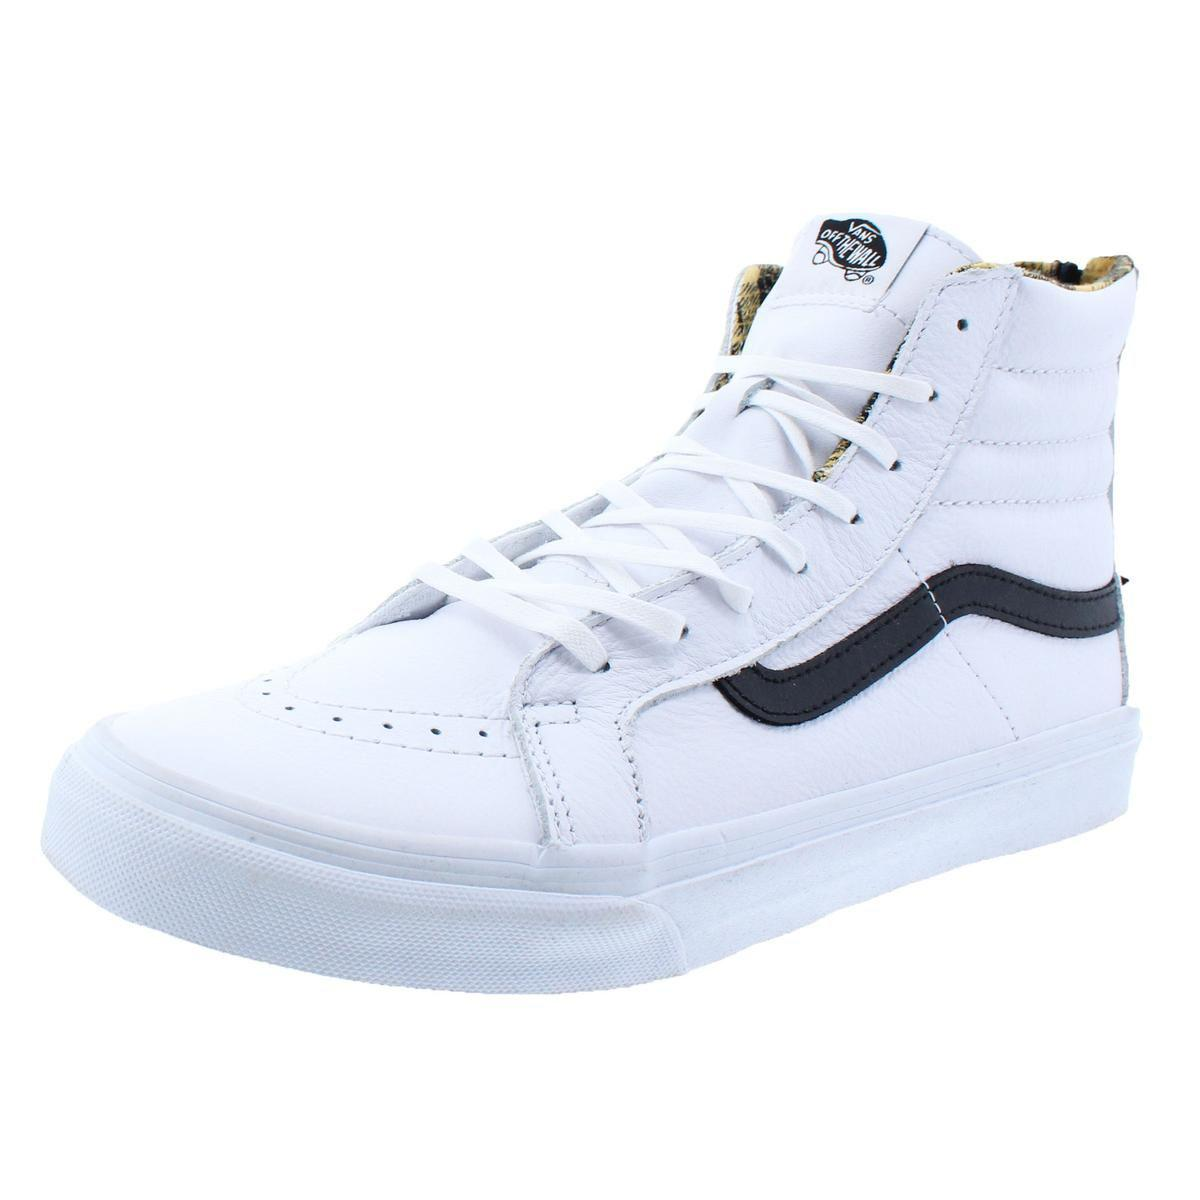 56036318a3 Vans. White Womens Sk8-hi Slim Zip Fashion Trainer Skateboarding Shoes